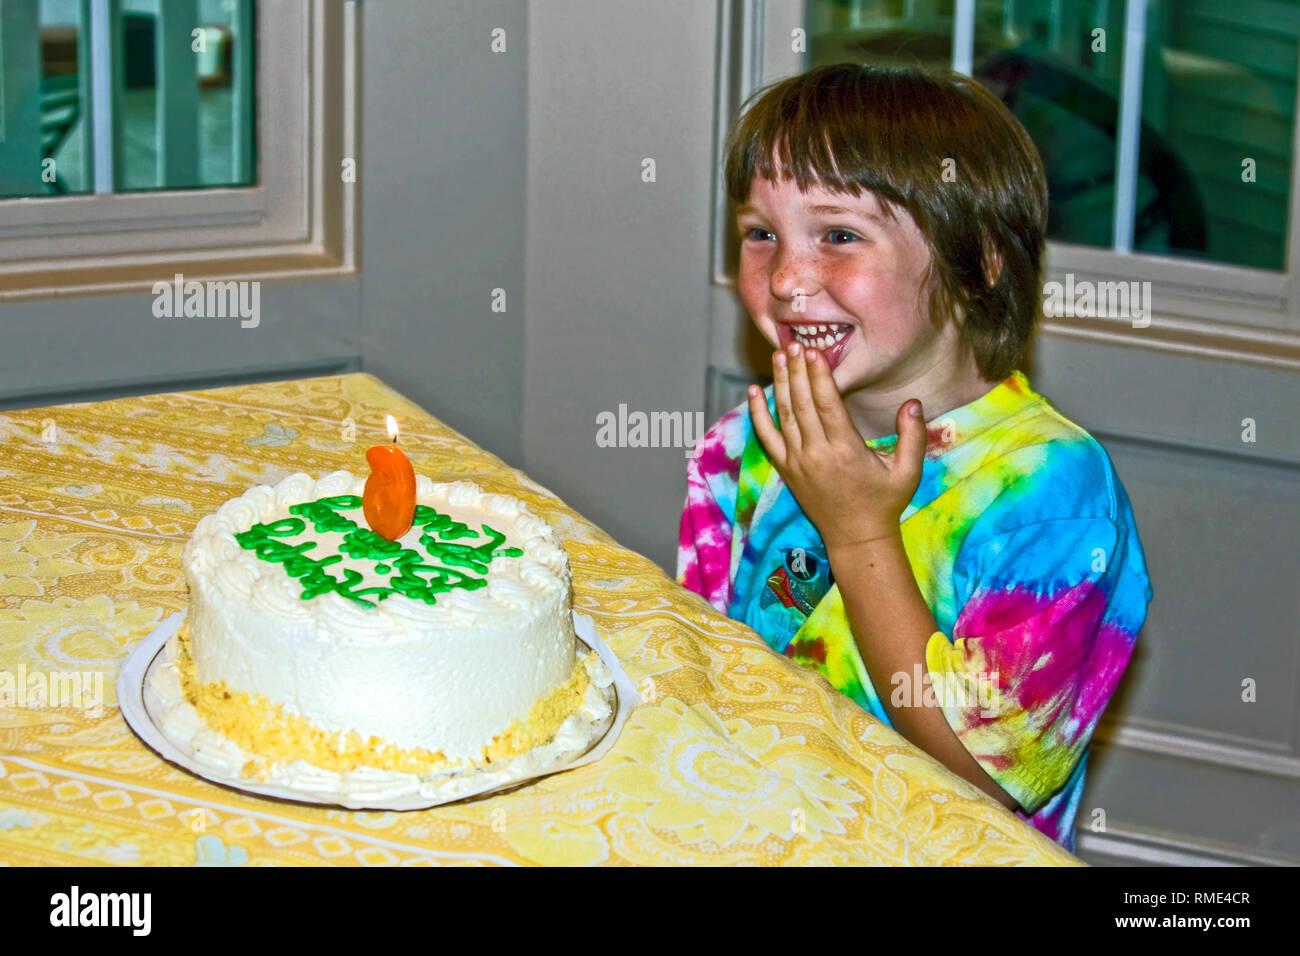 Young Boy Birthday Cake Smiling Hand At Mouth Celebration Happy Tie Dye Shirt 6 Years Old Child Celebration Horizontal Mr Stock Photo Alamy